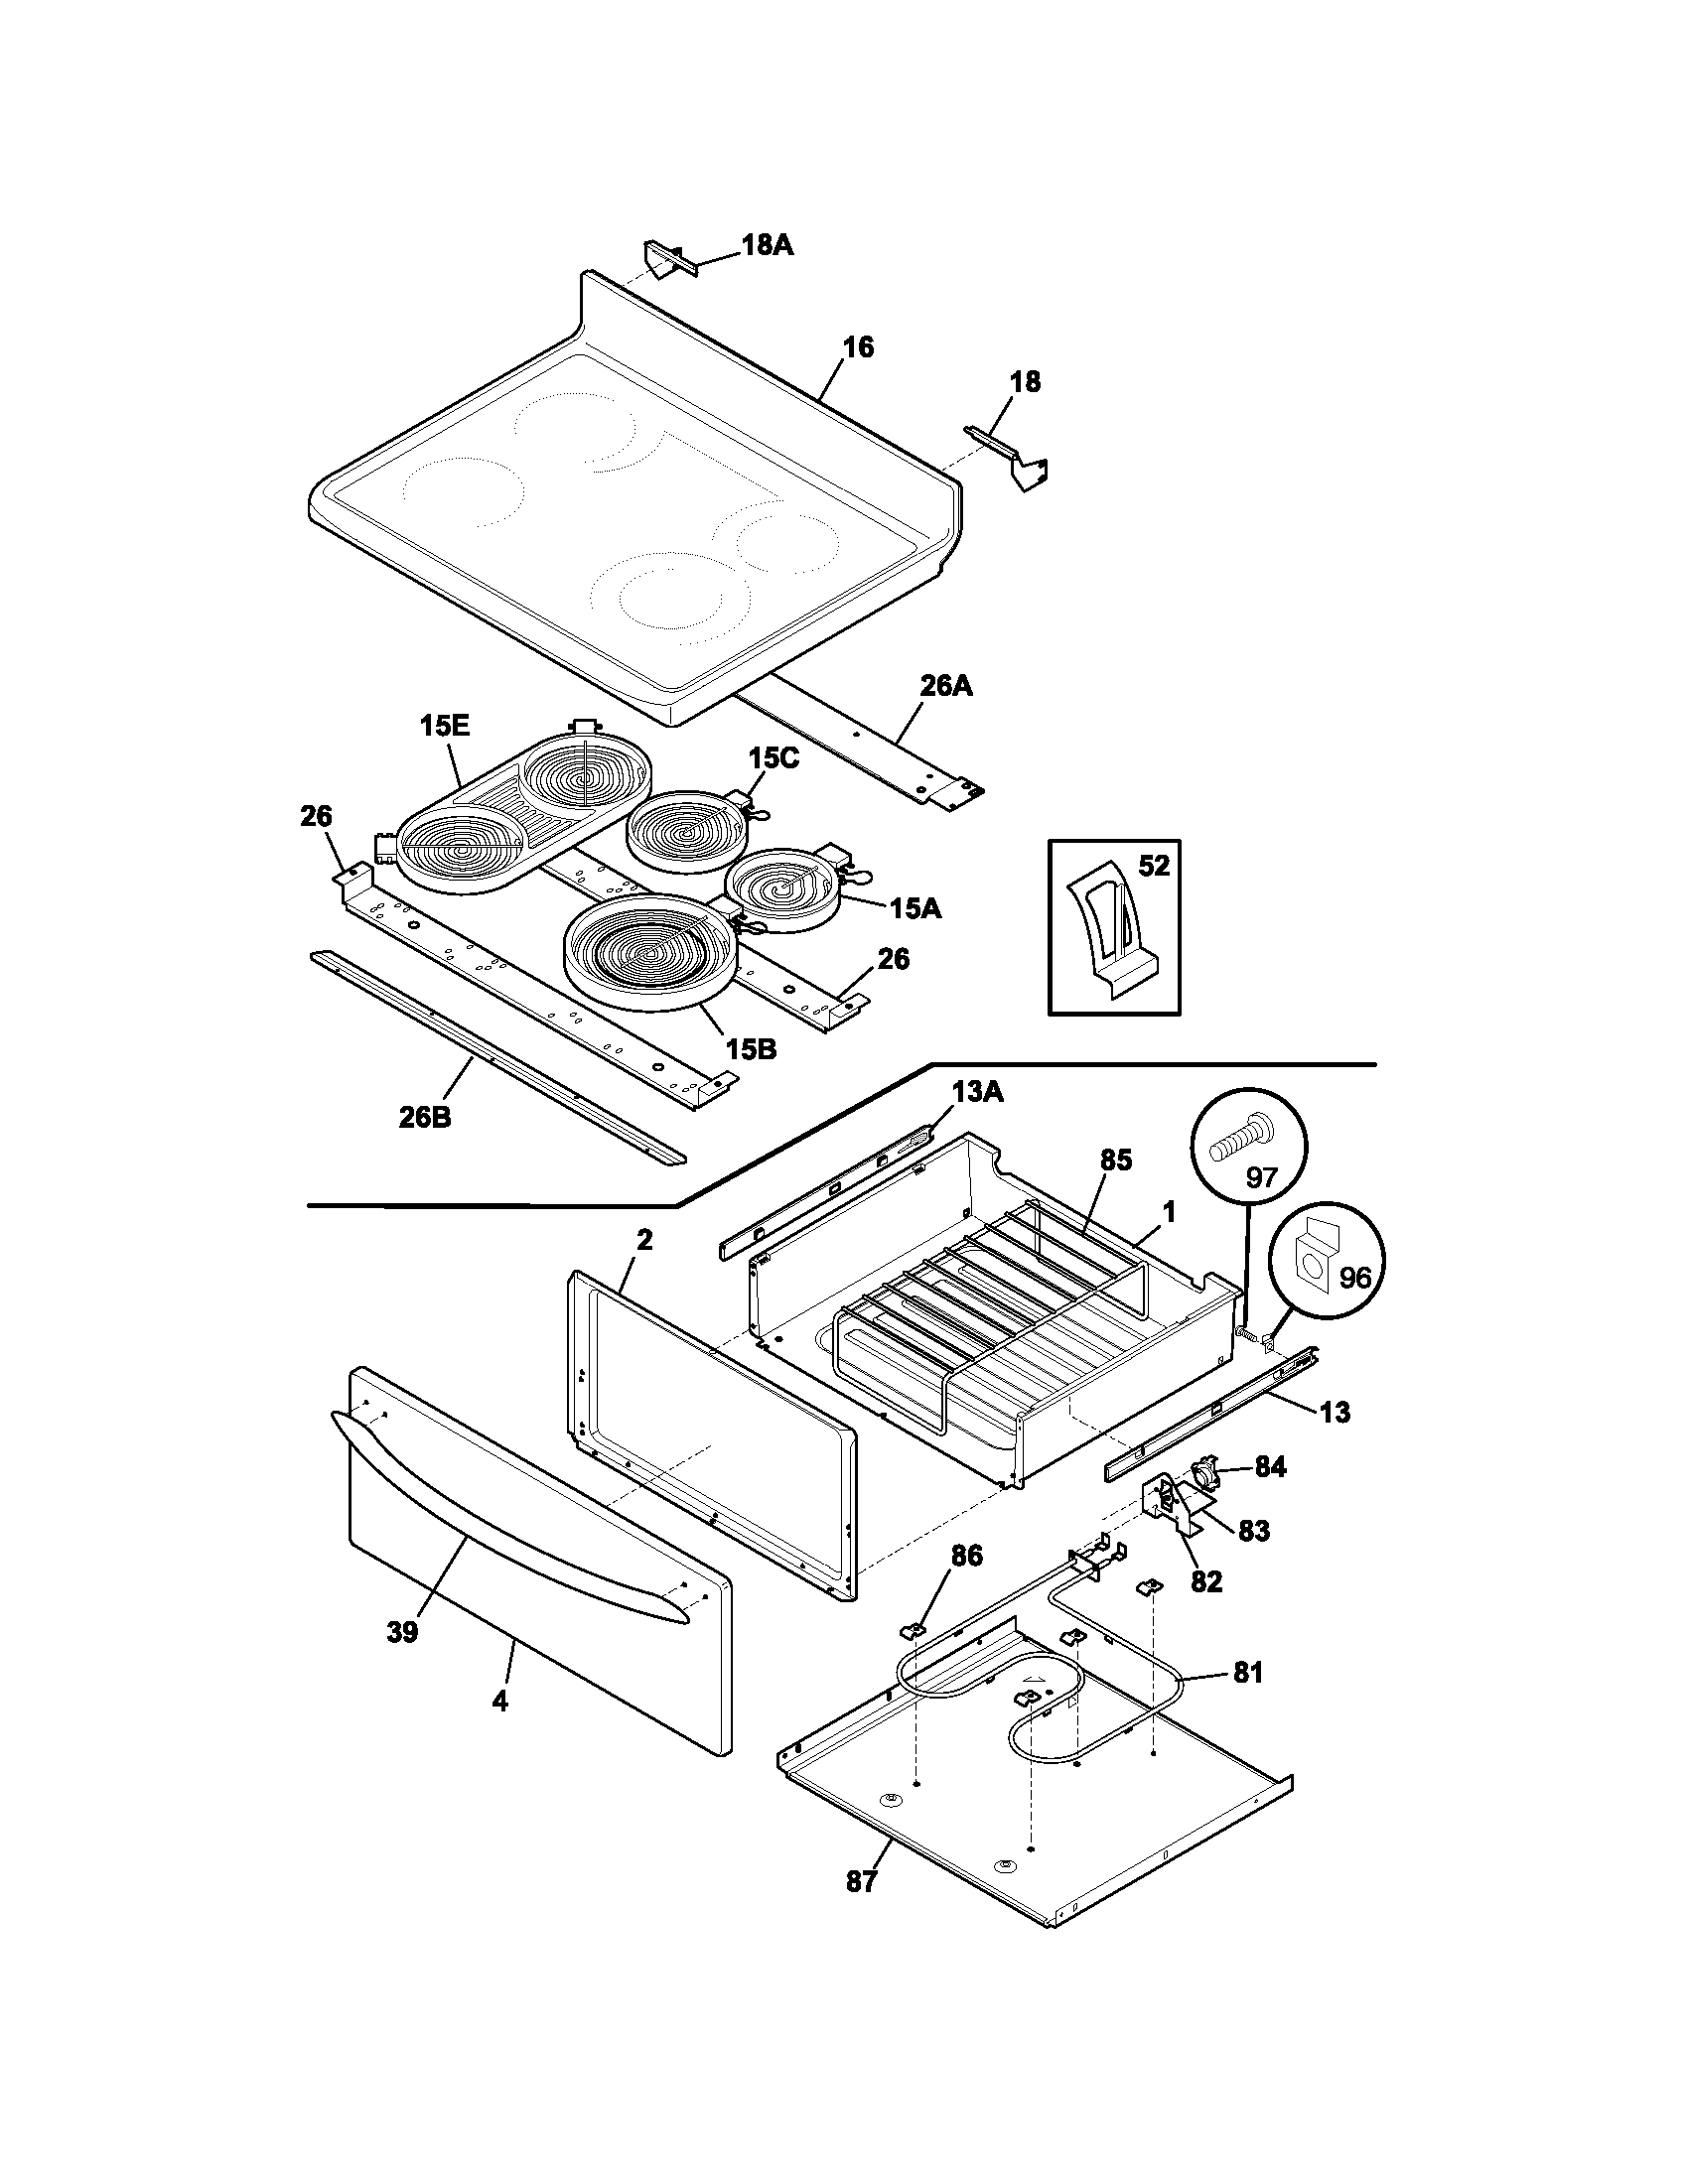 47re wiring diagram 1993 chevy 1500 545rfe transmission imageresizertool com